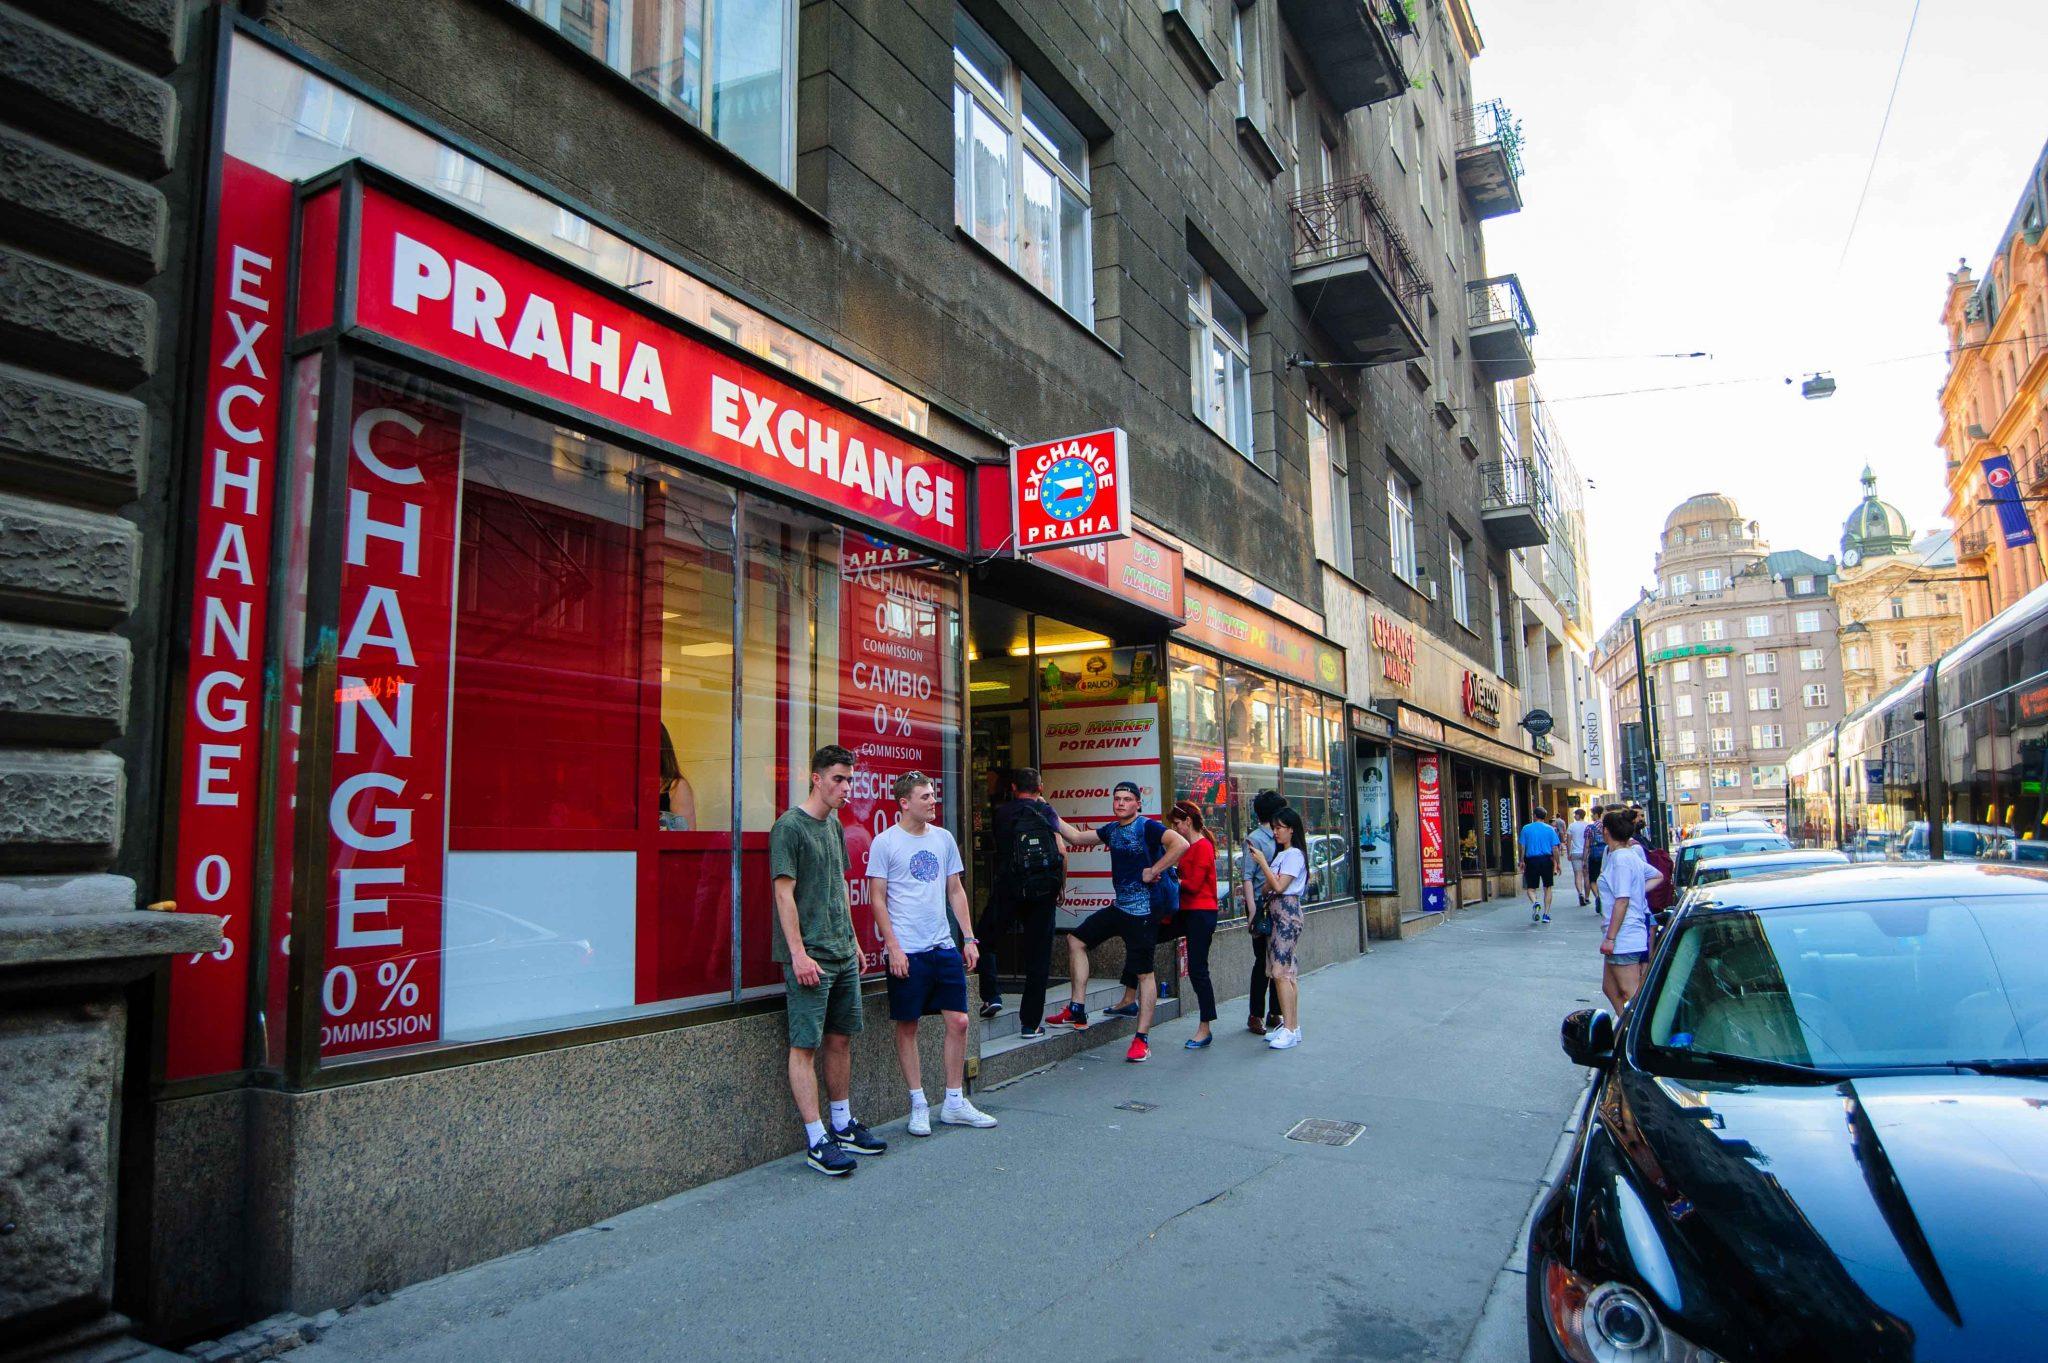 Praha Exchange Office nearby Wenceslas Square